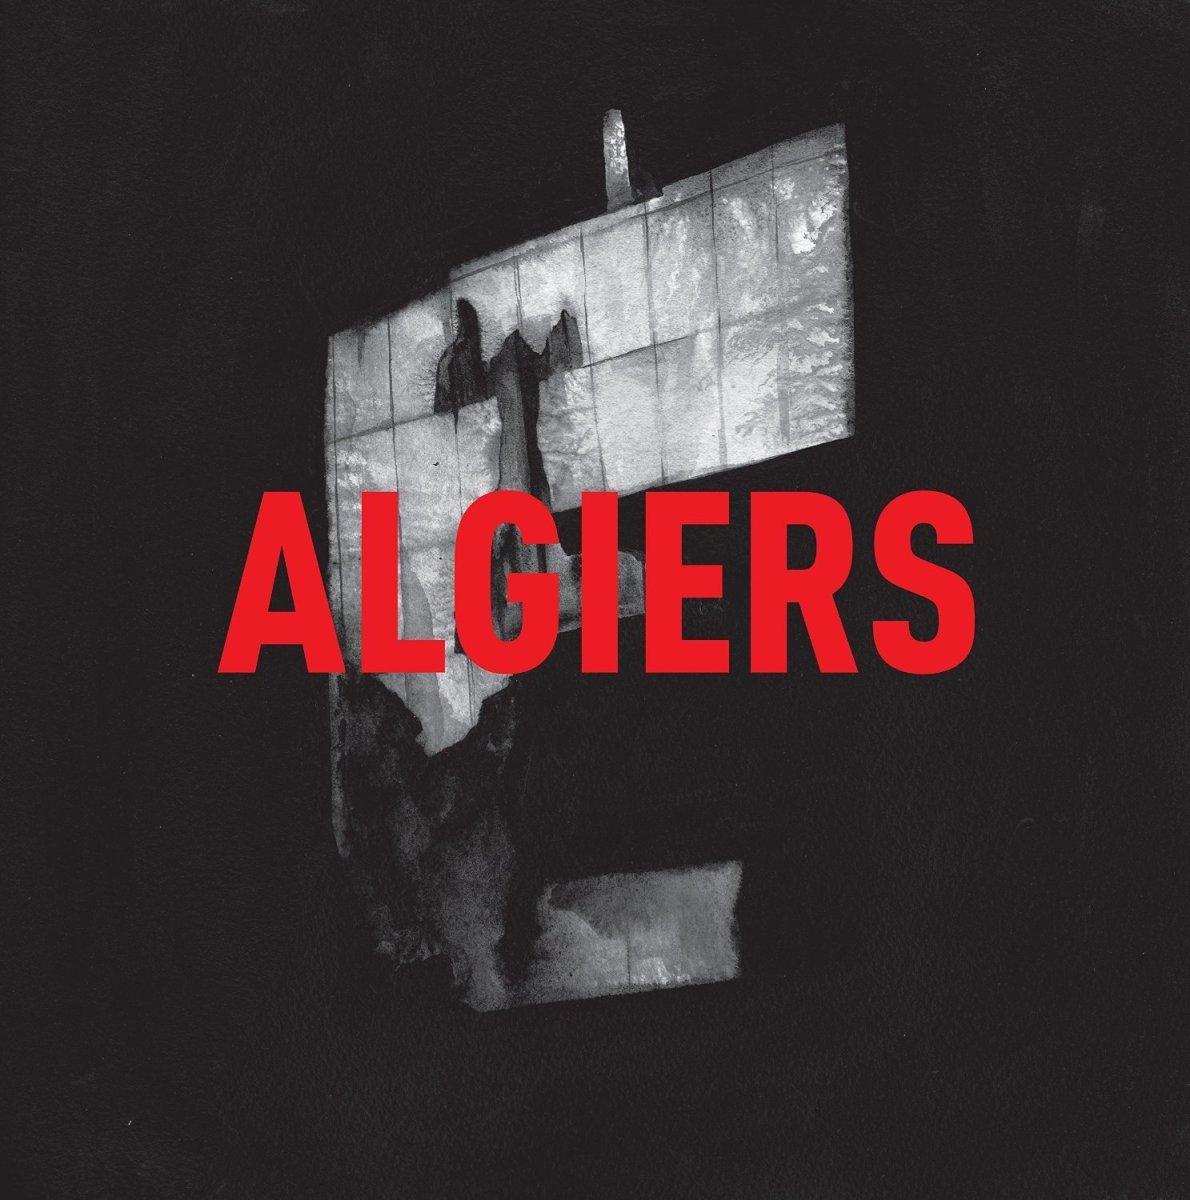 Algiers - Algiers (2015)